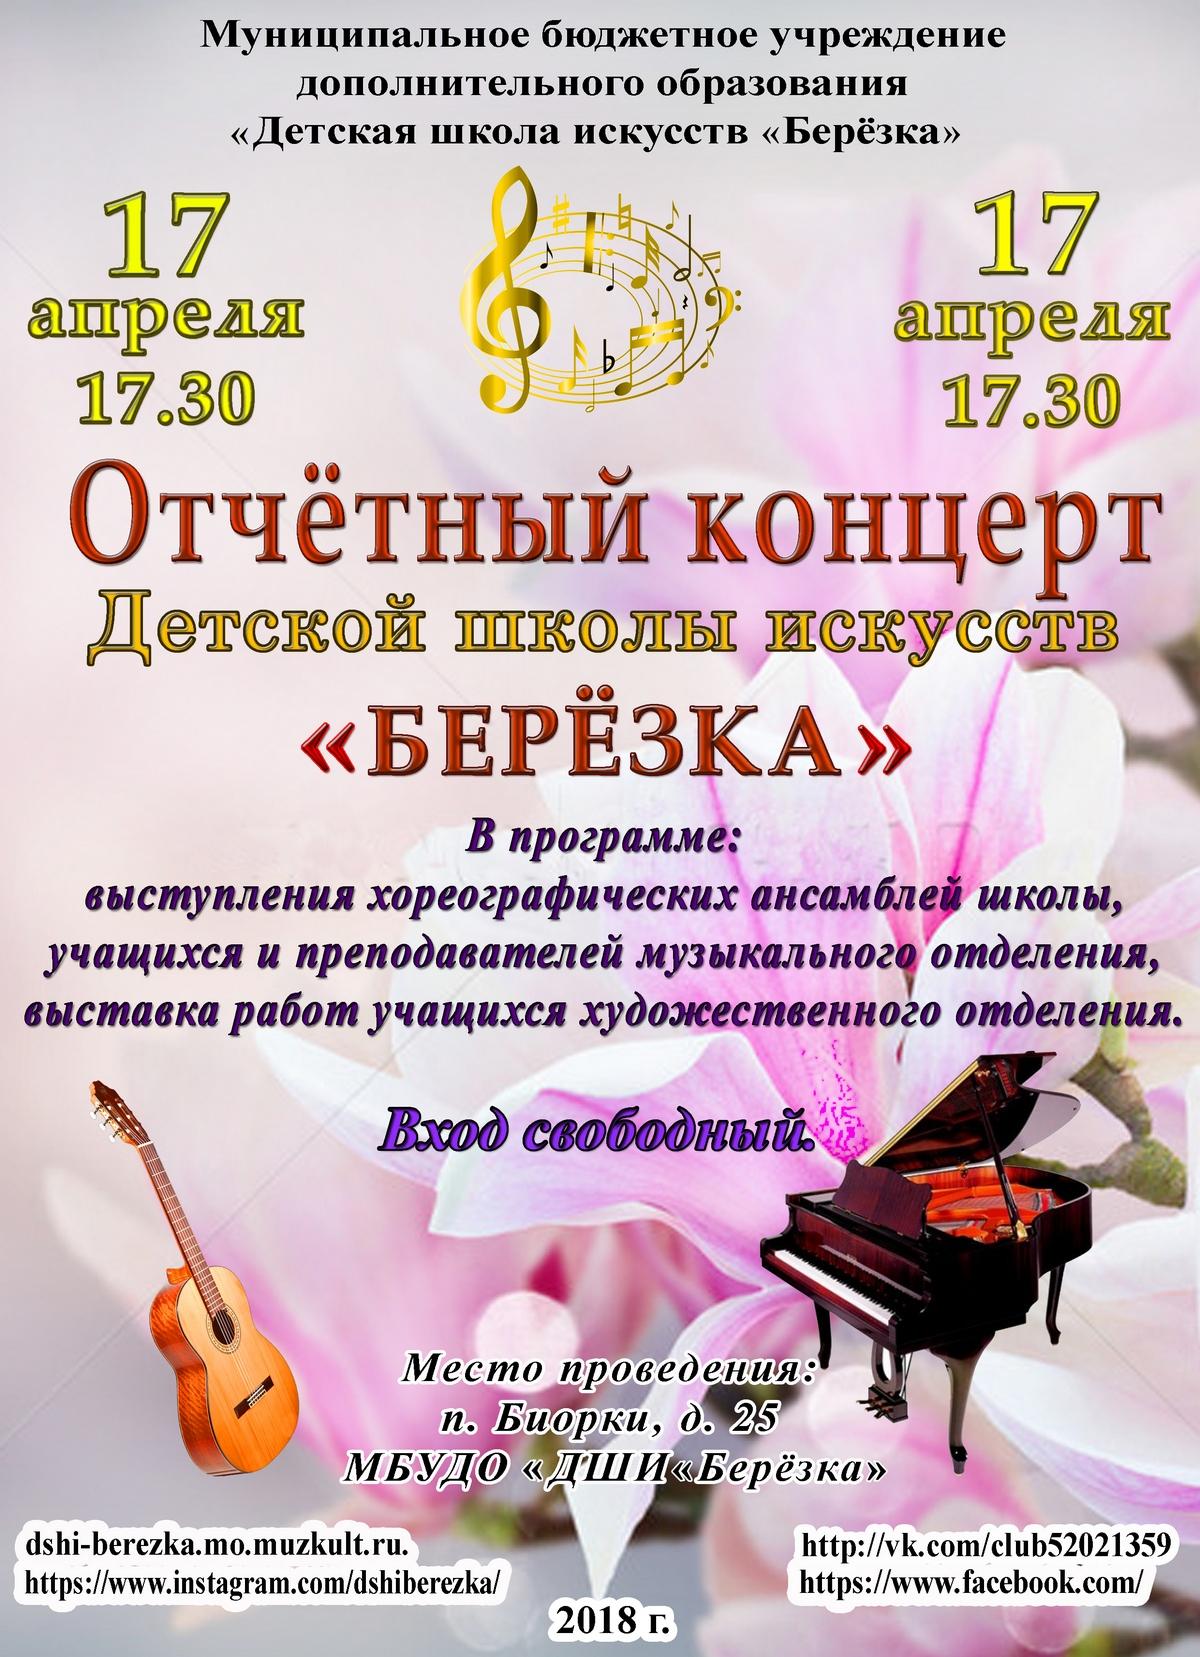 ДШИ «Березка» приглашает на концерт